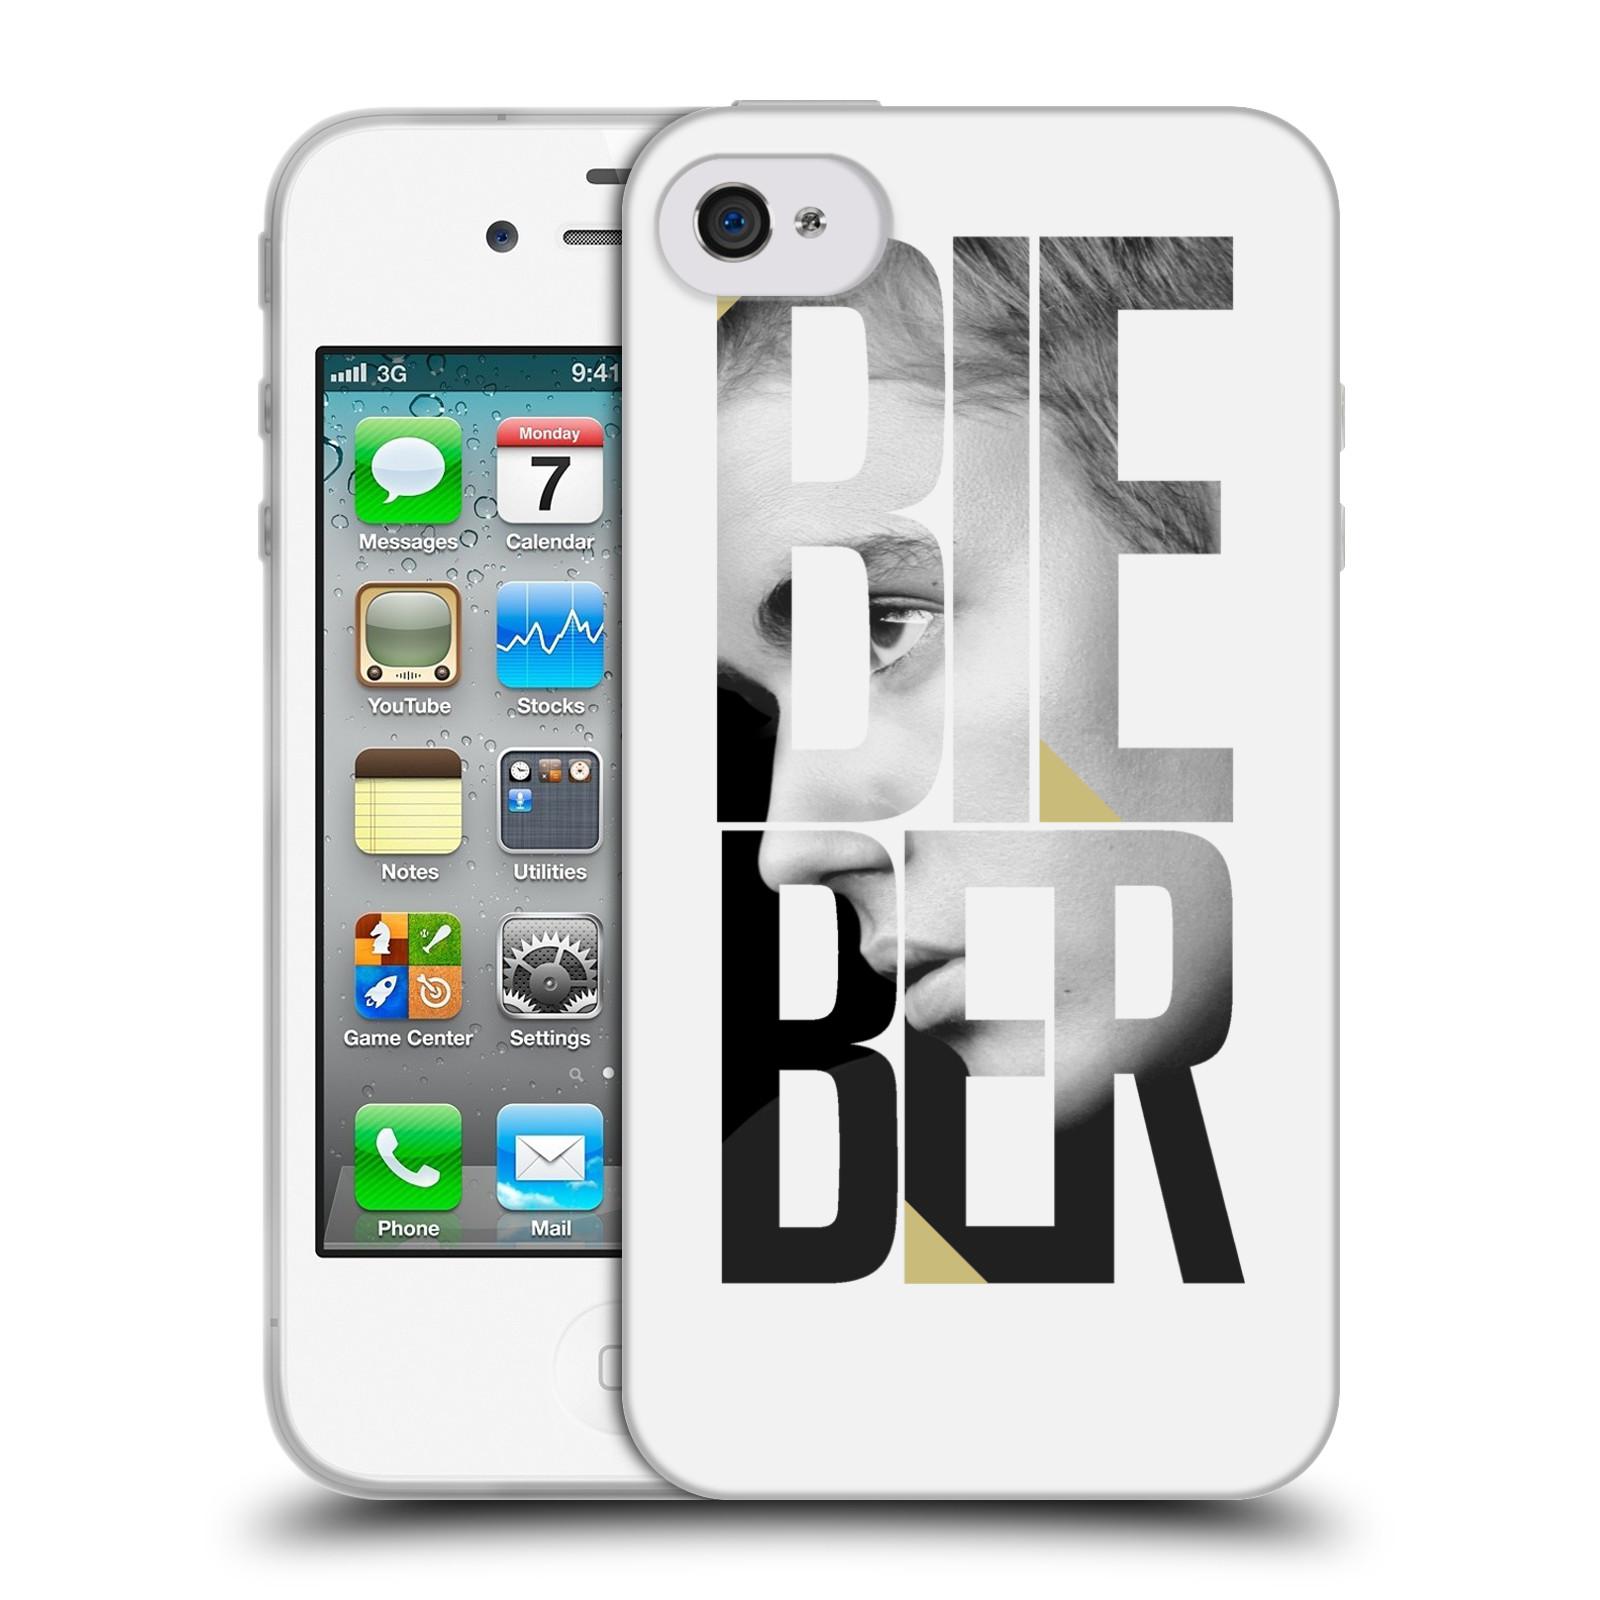 HEAD CASE silikonový obal na mobil Apple Iphone 4 / 4S originální potisk Justin Bieber nadpis fotka